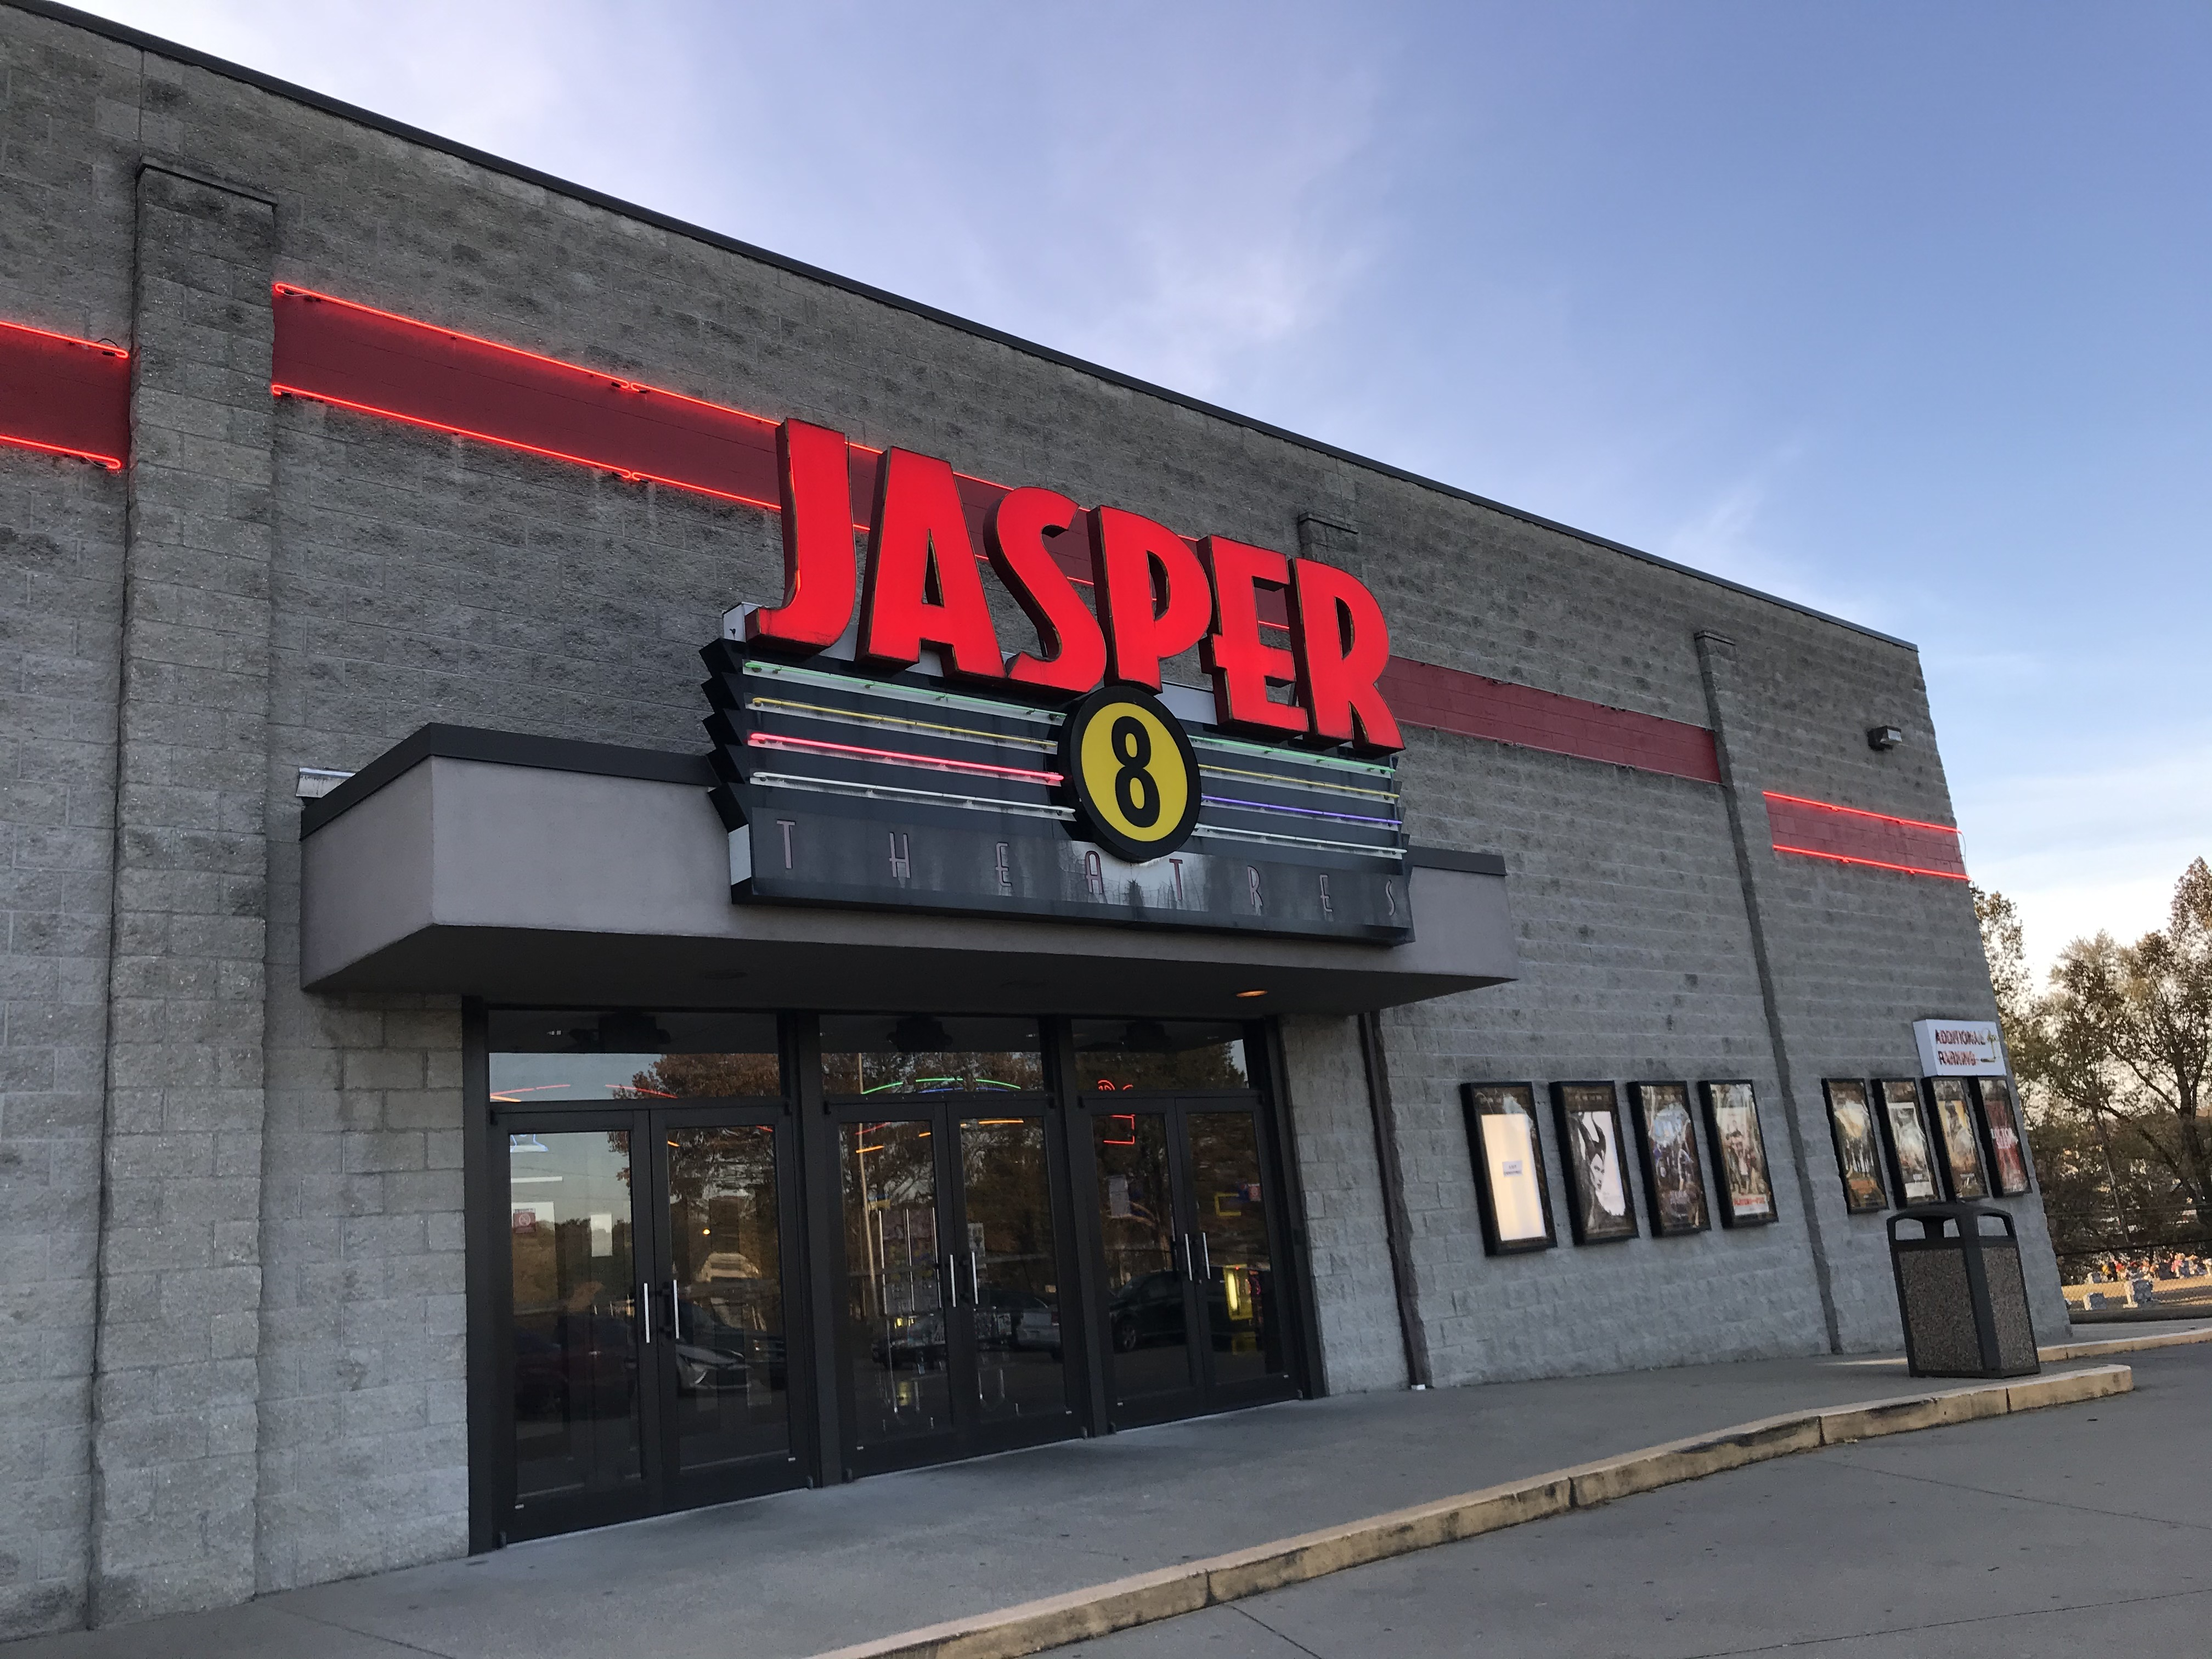 Photo for Showplace Jasper 8